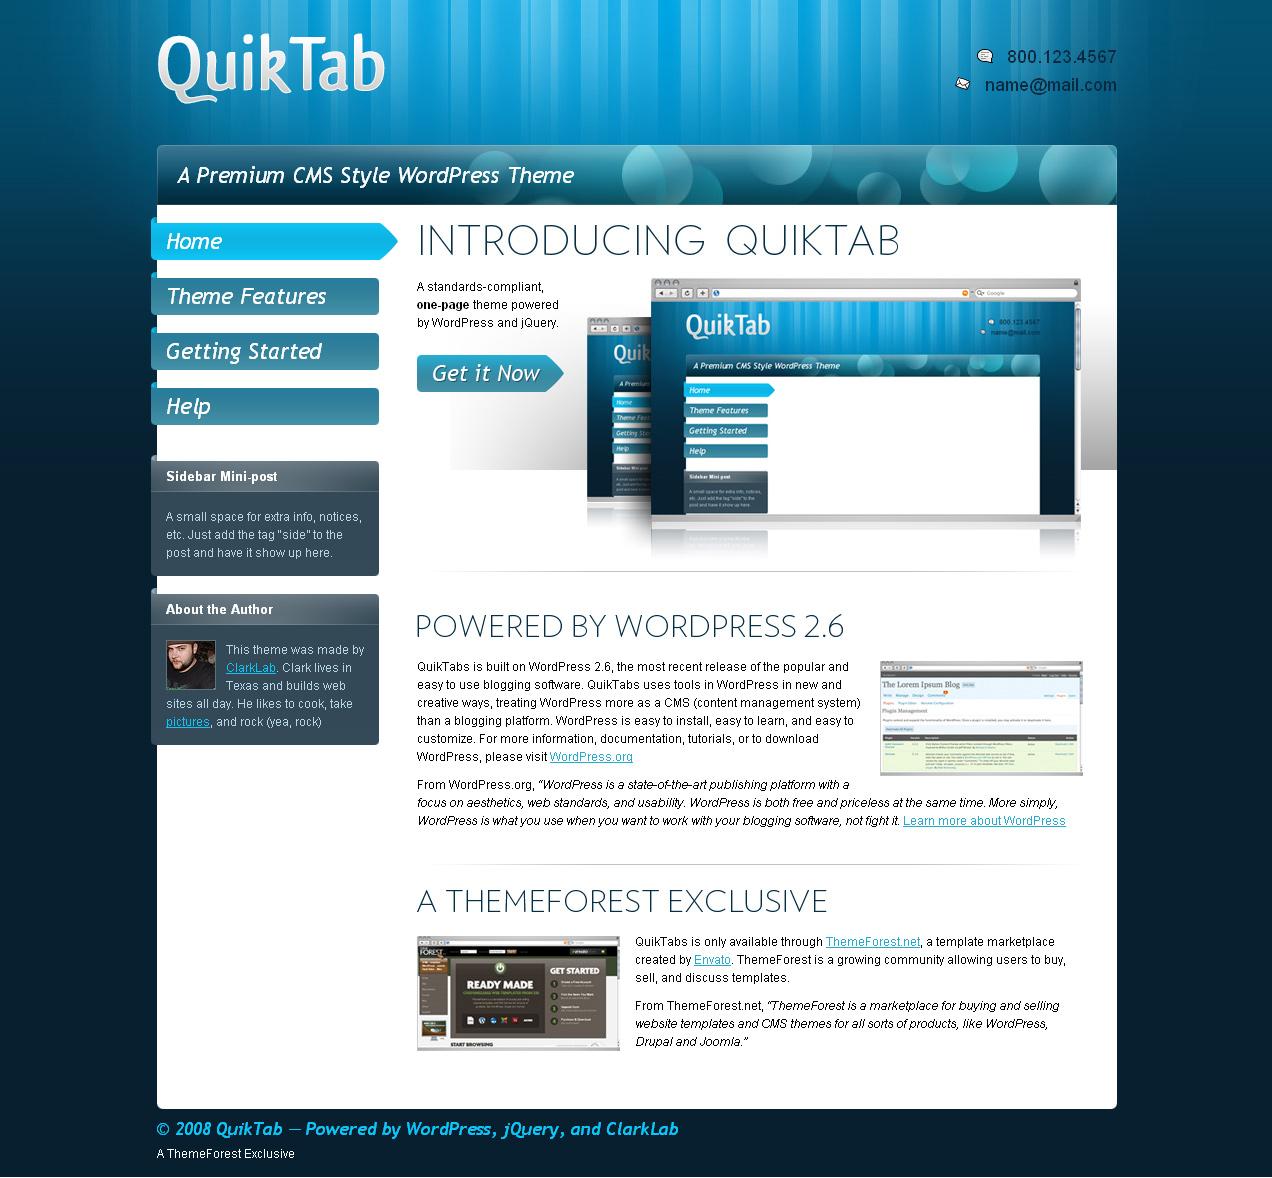 Quiktab Theme